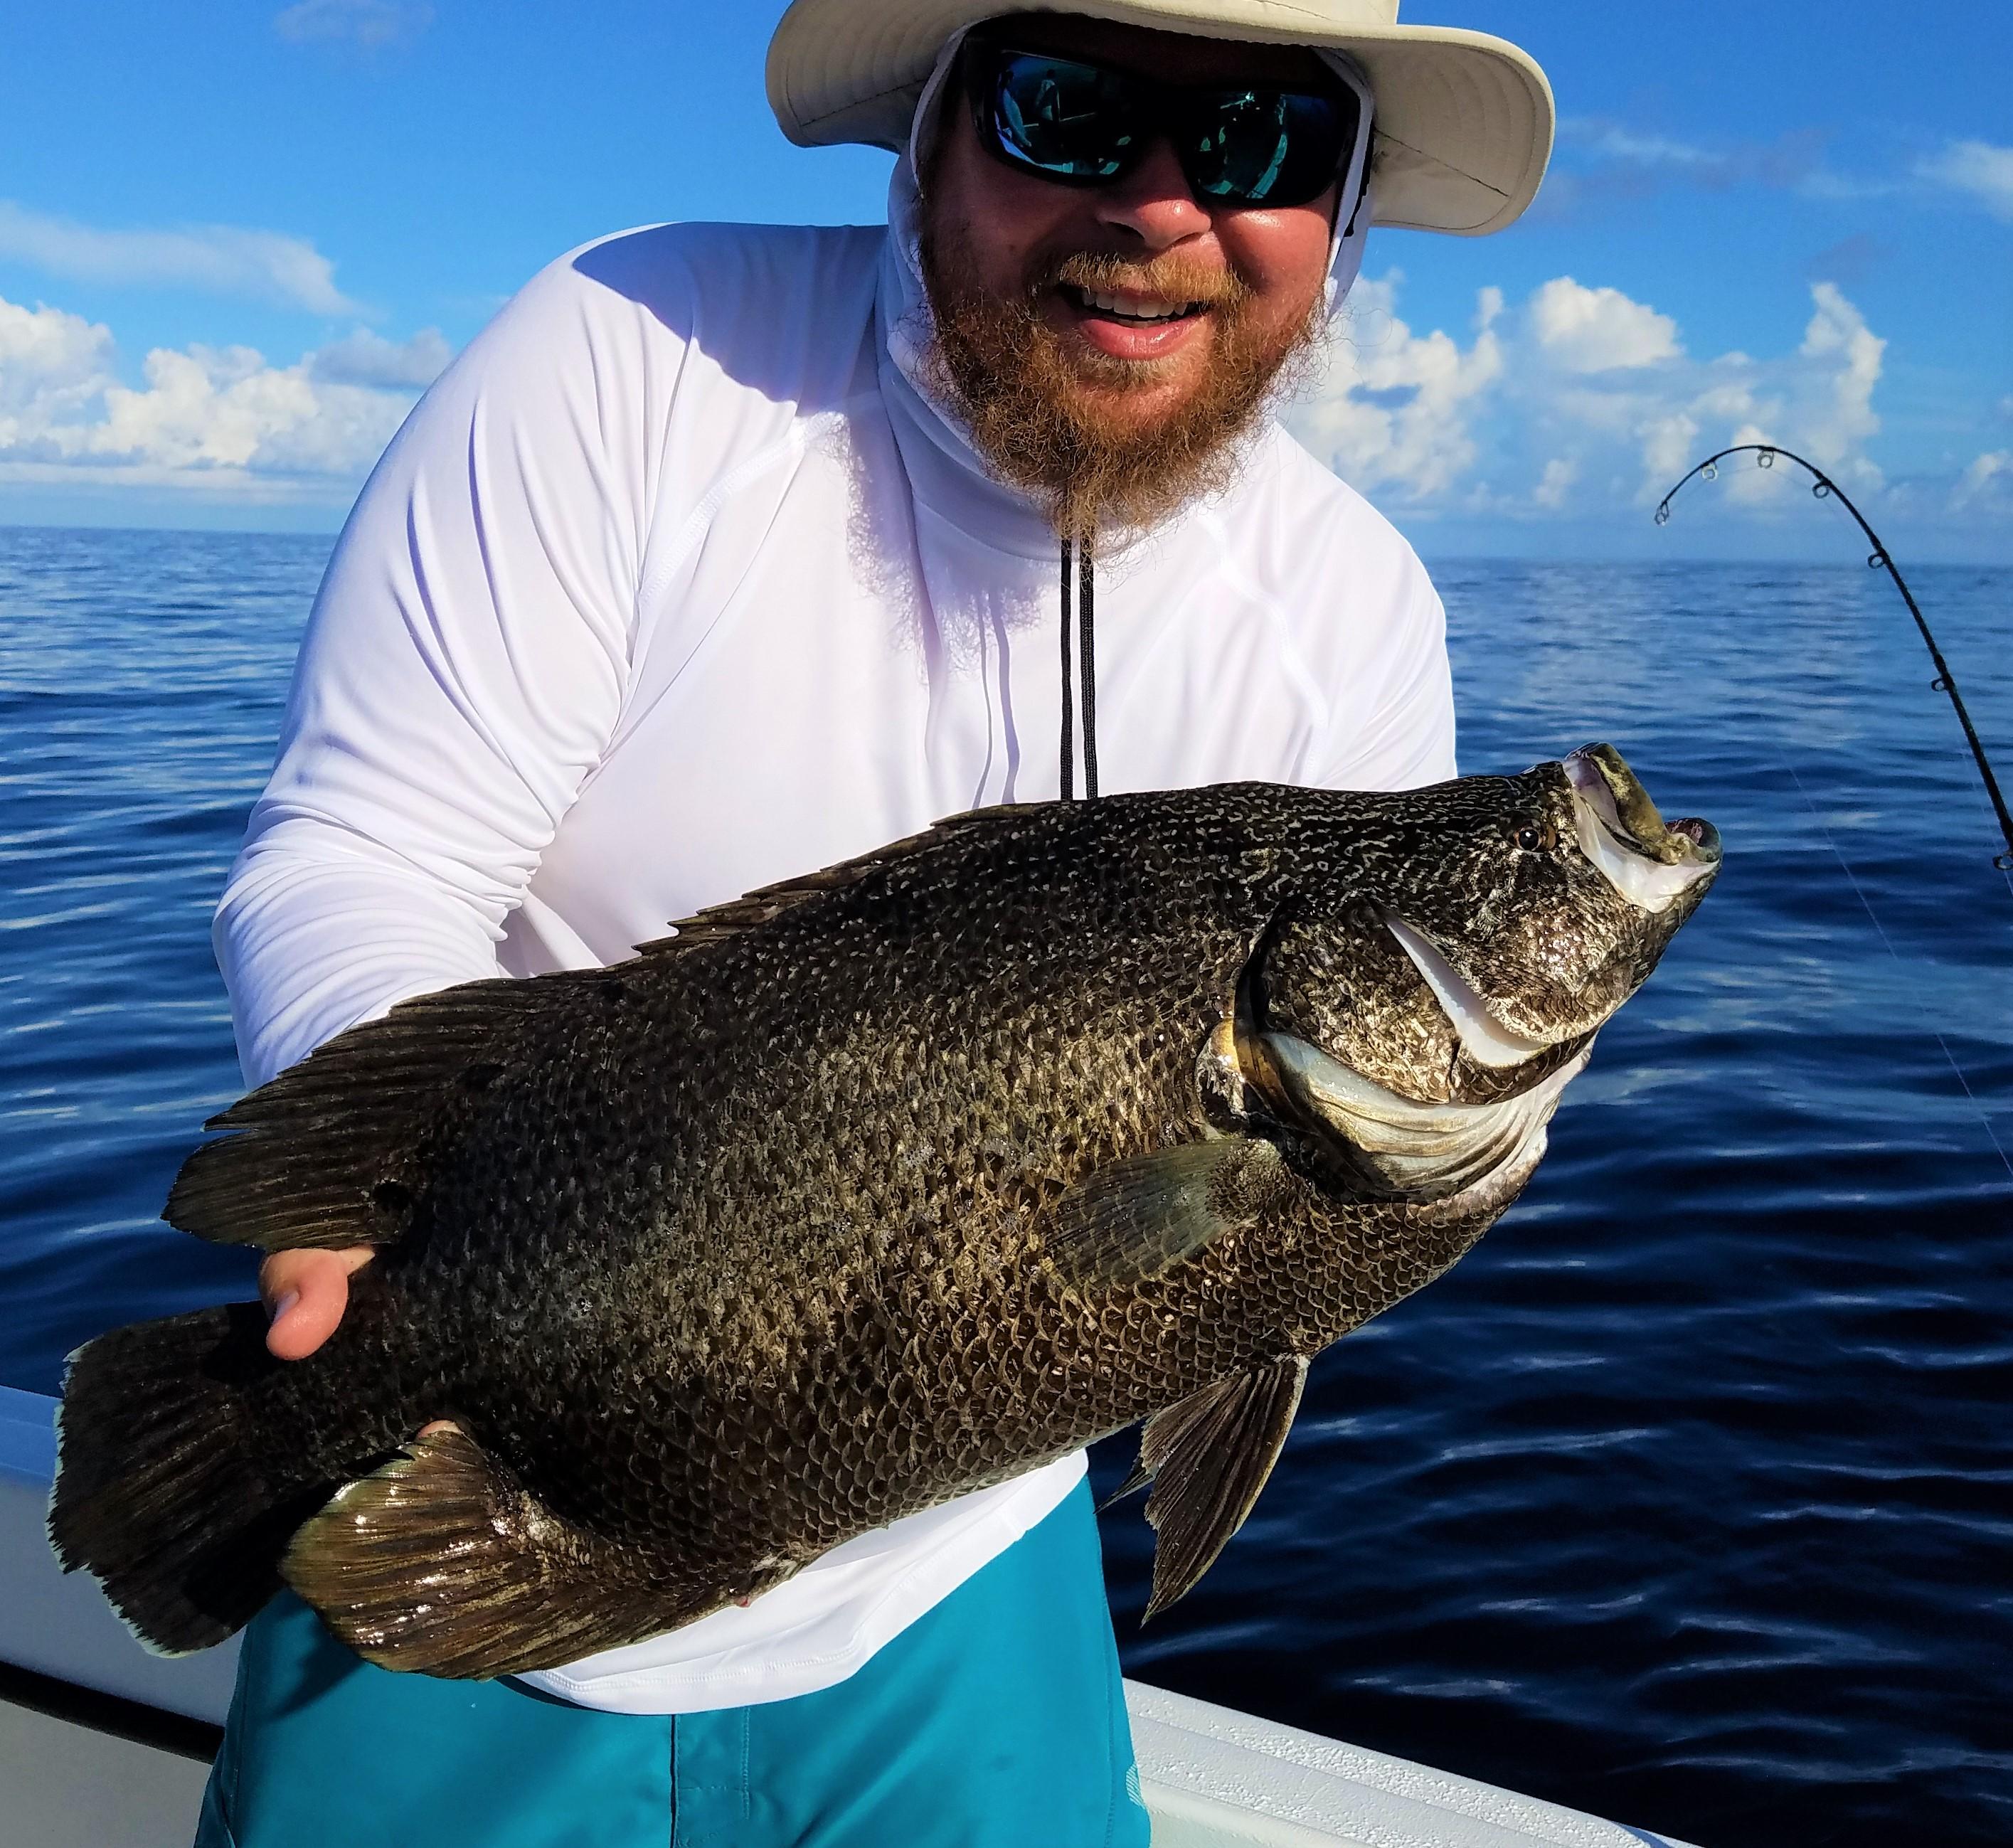 4db1feda7b0ca Hubbard s Marina Fishing Report 8 24 18 - Hubbard s Marina